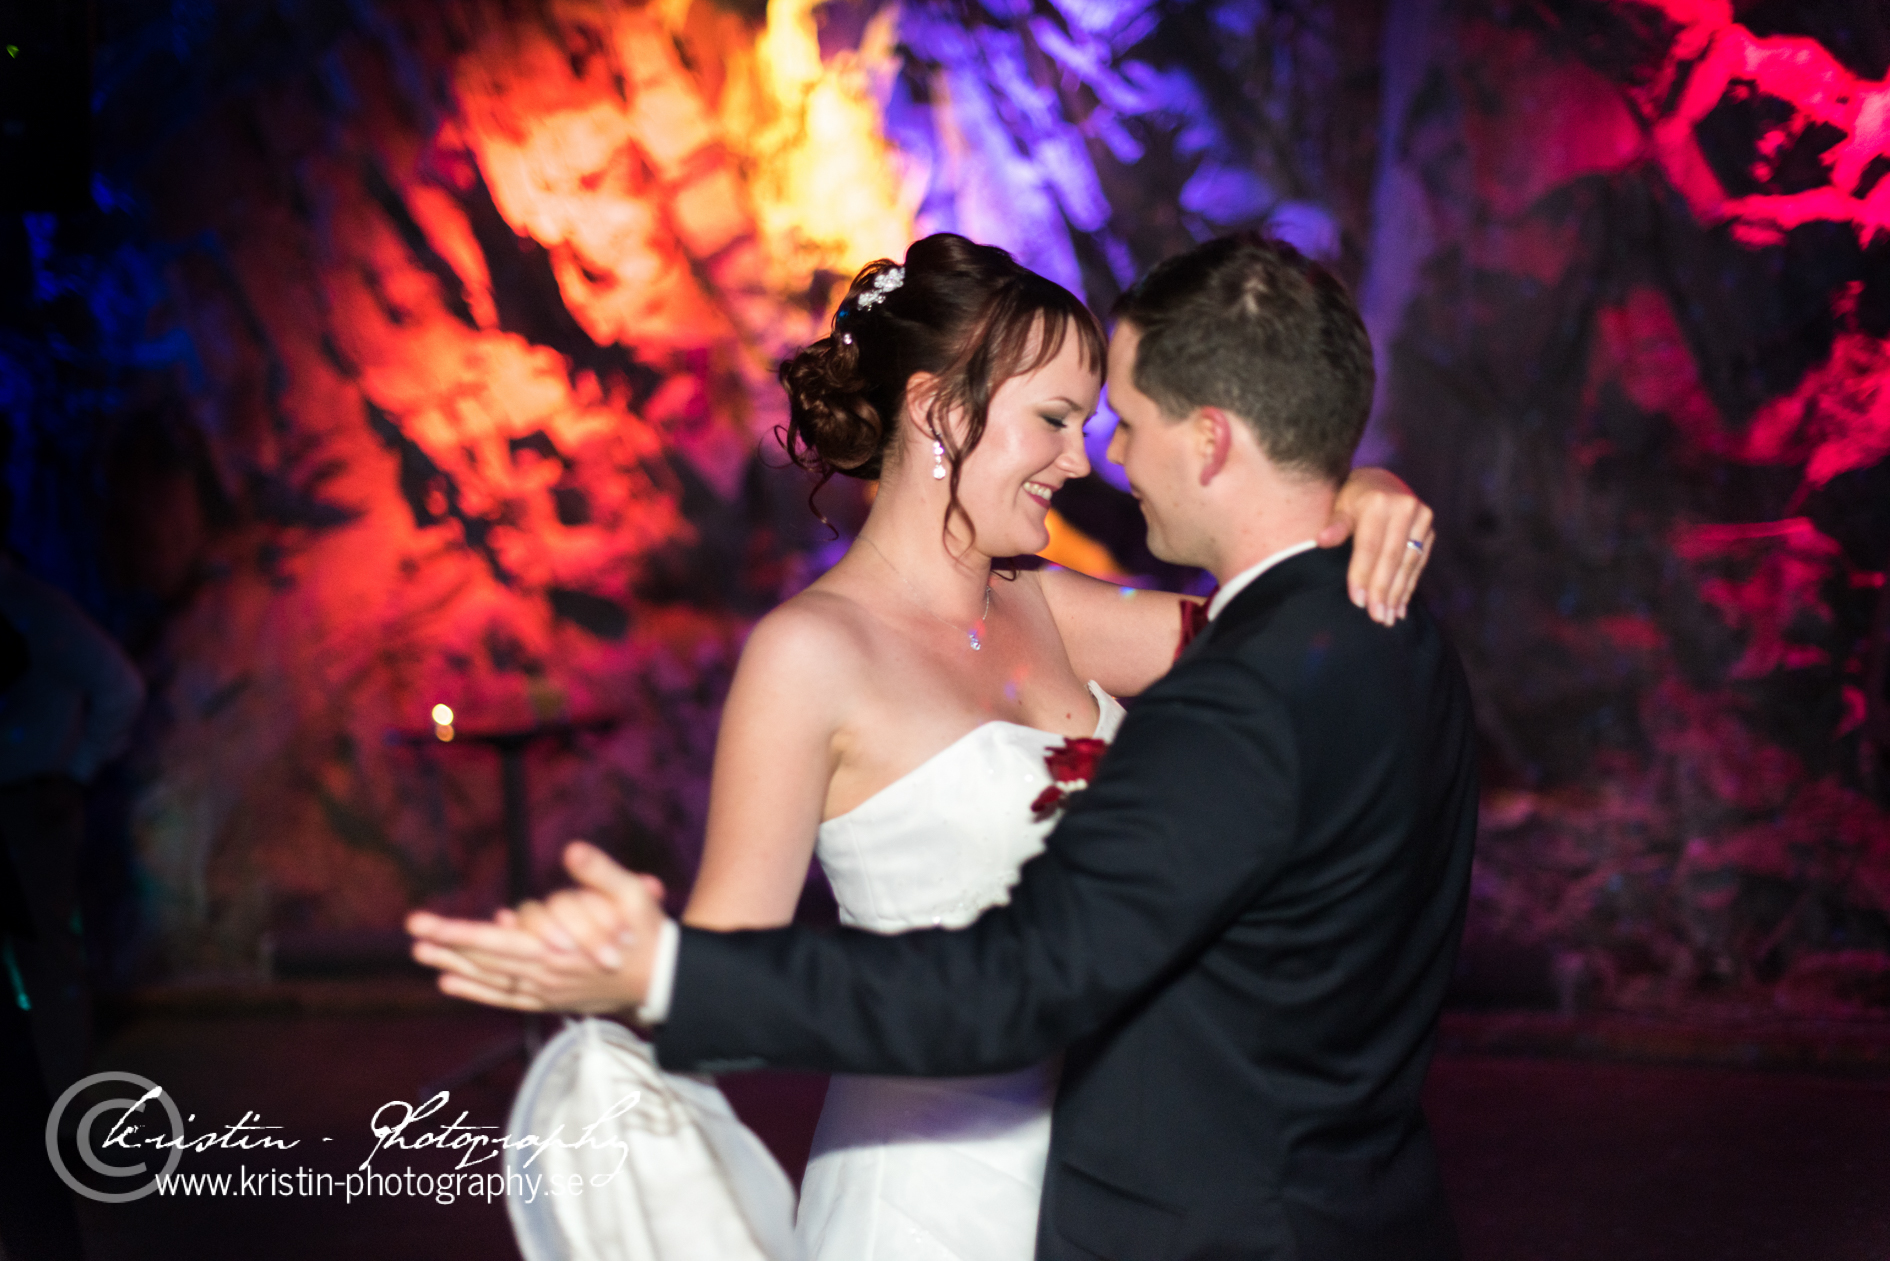 Bröllopsfotograf i Stockholm, Kristin - Photography , Munchen Bryggeriet-296.jpg